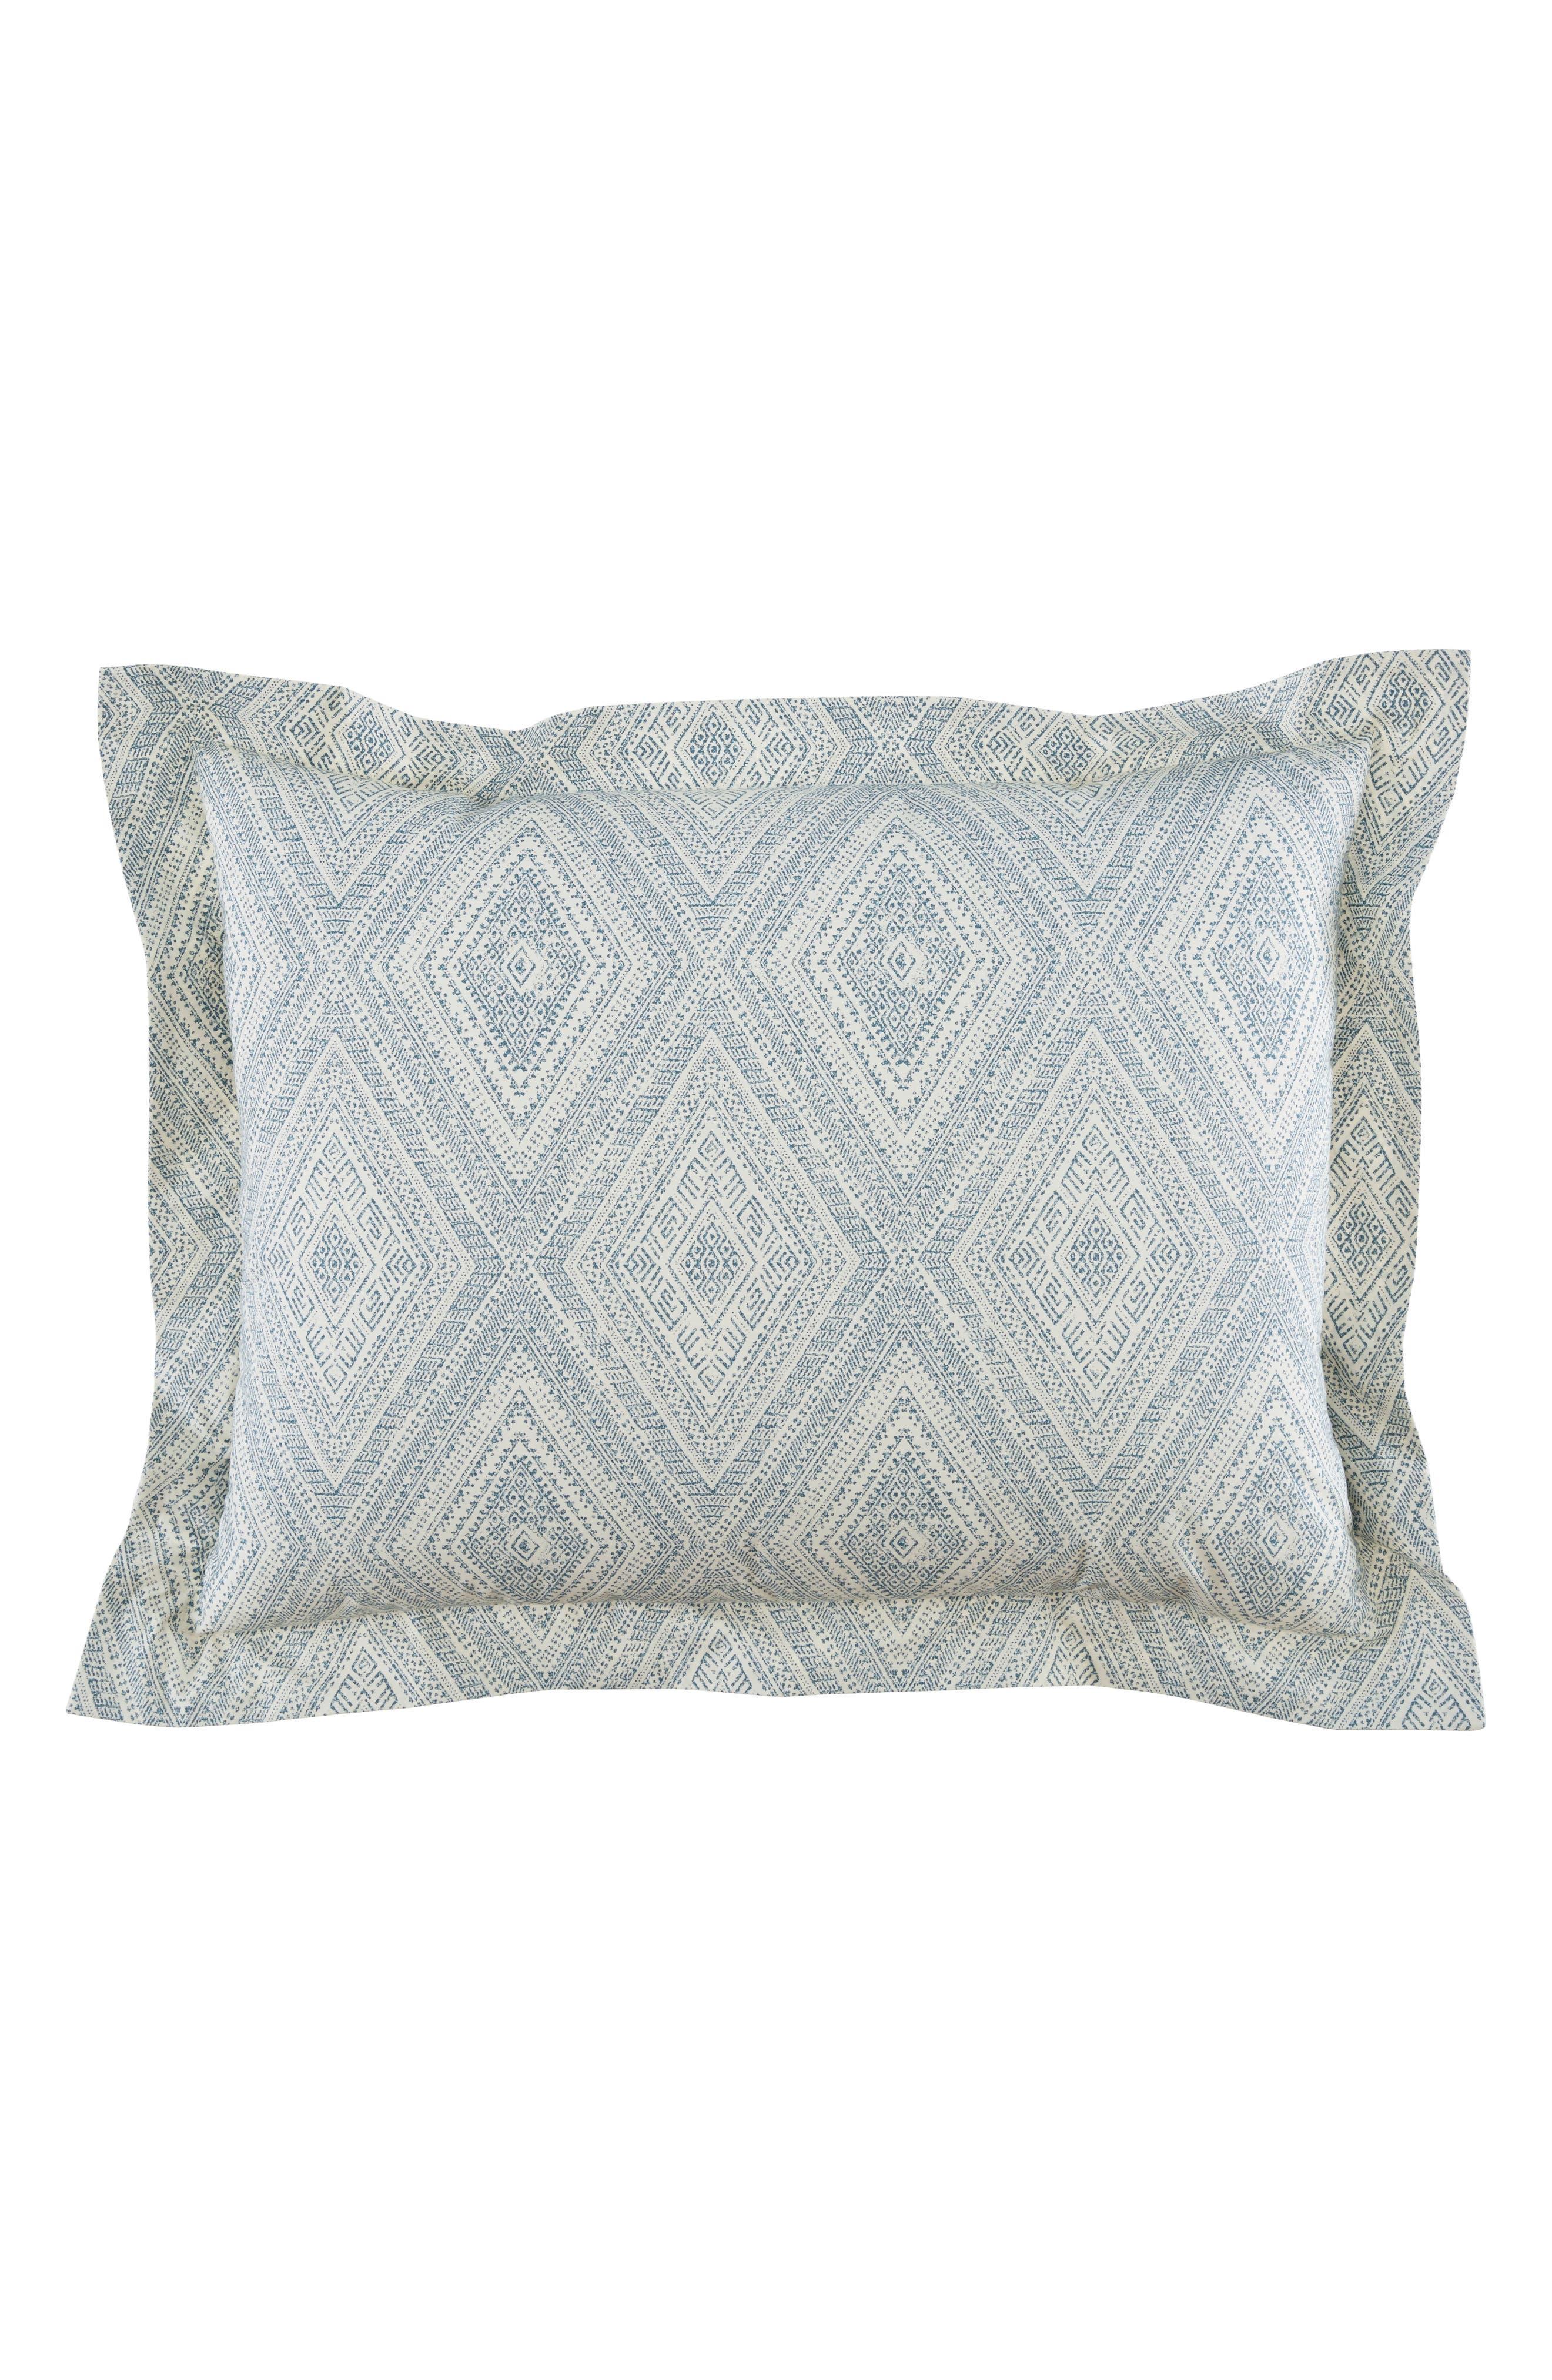 Caspiane 200 Thread Count Pair of Pillow Shams,                             Main thumbnail 1, color,                             412